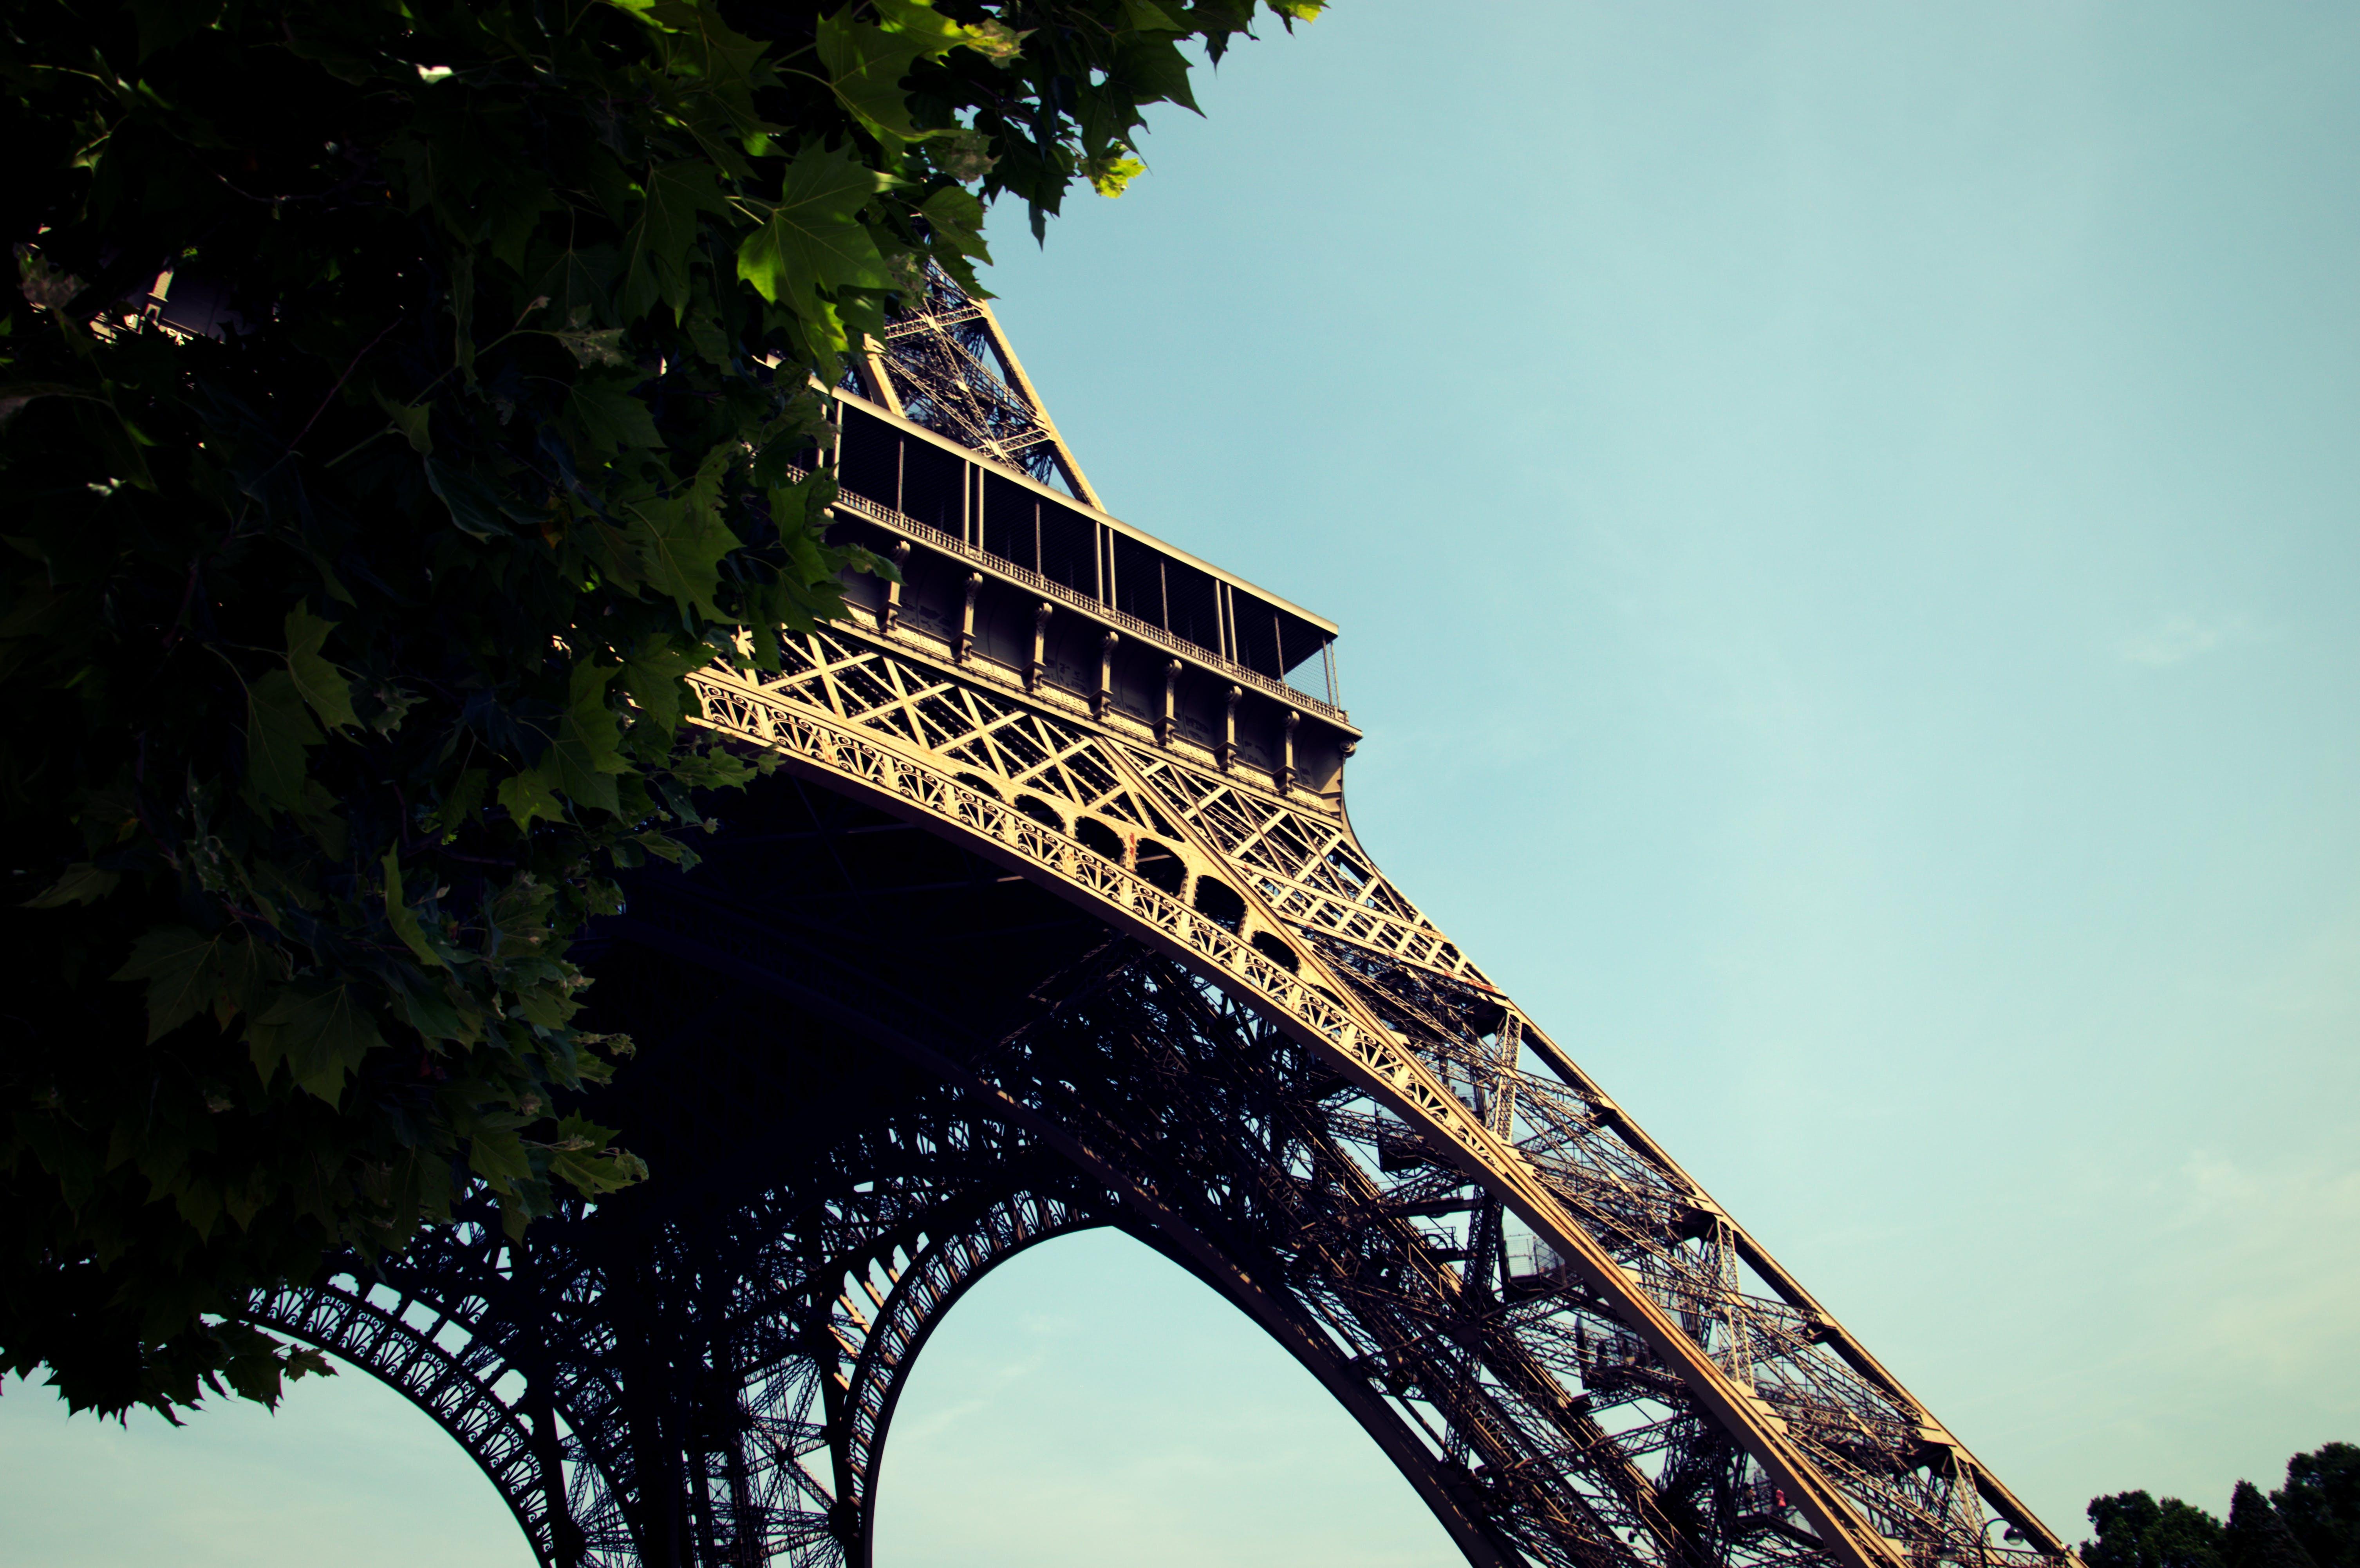 Eiffel Tower, Paris France Digital Wallpaper